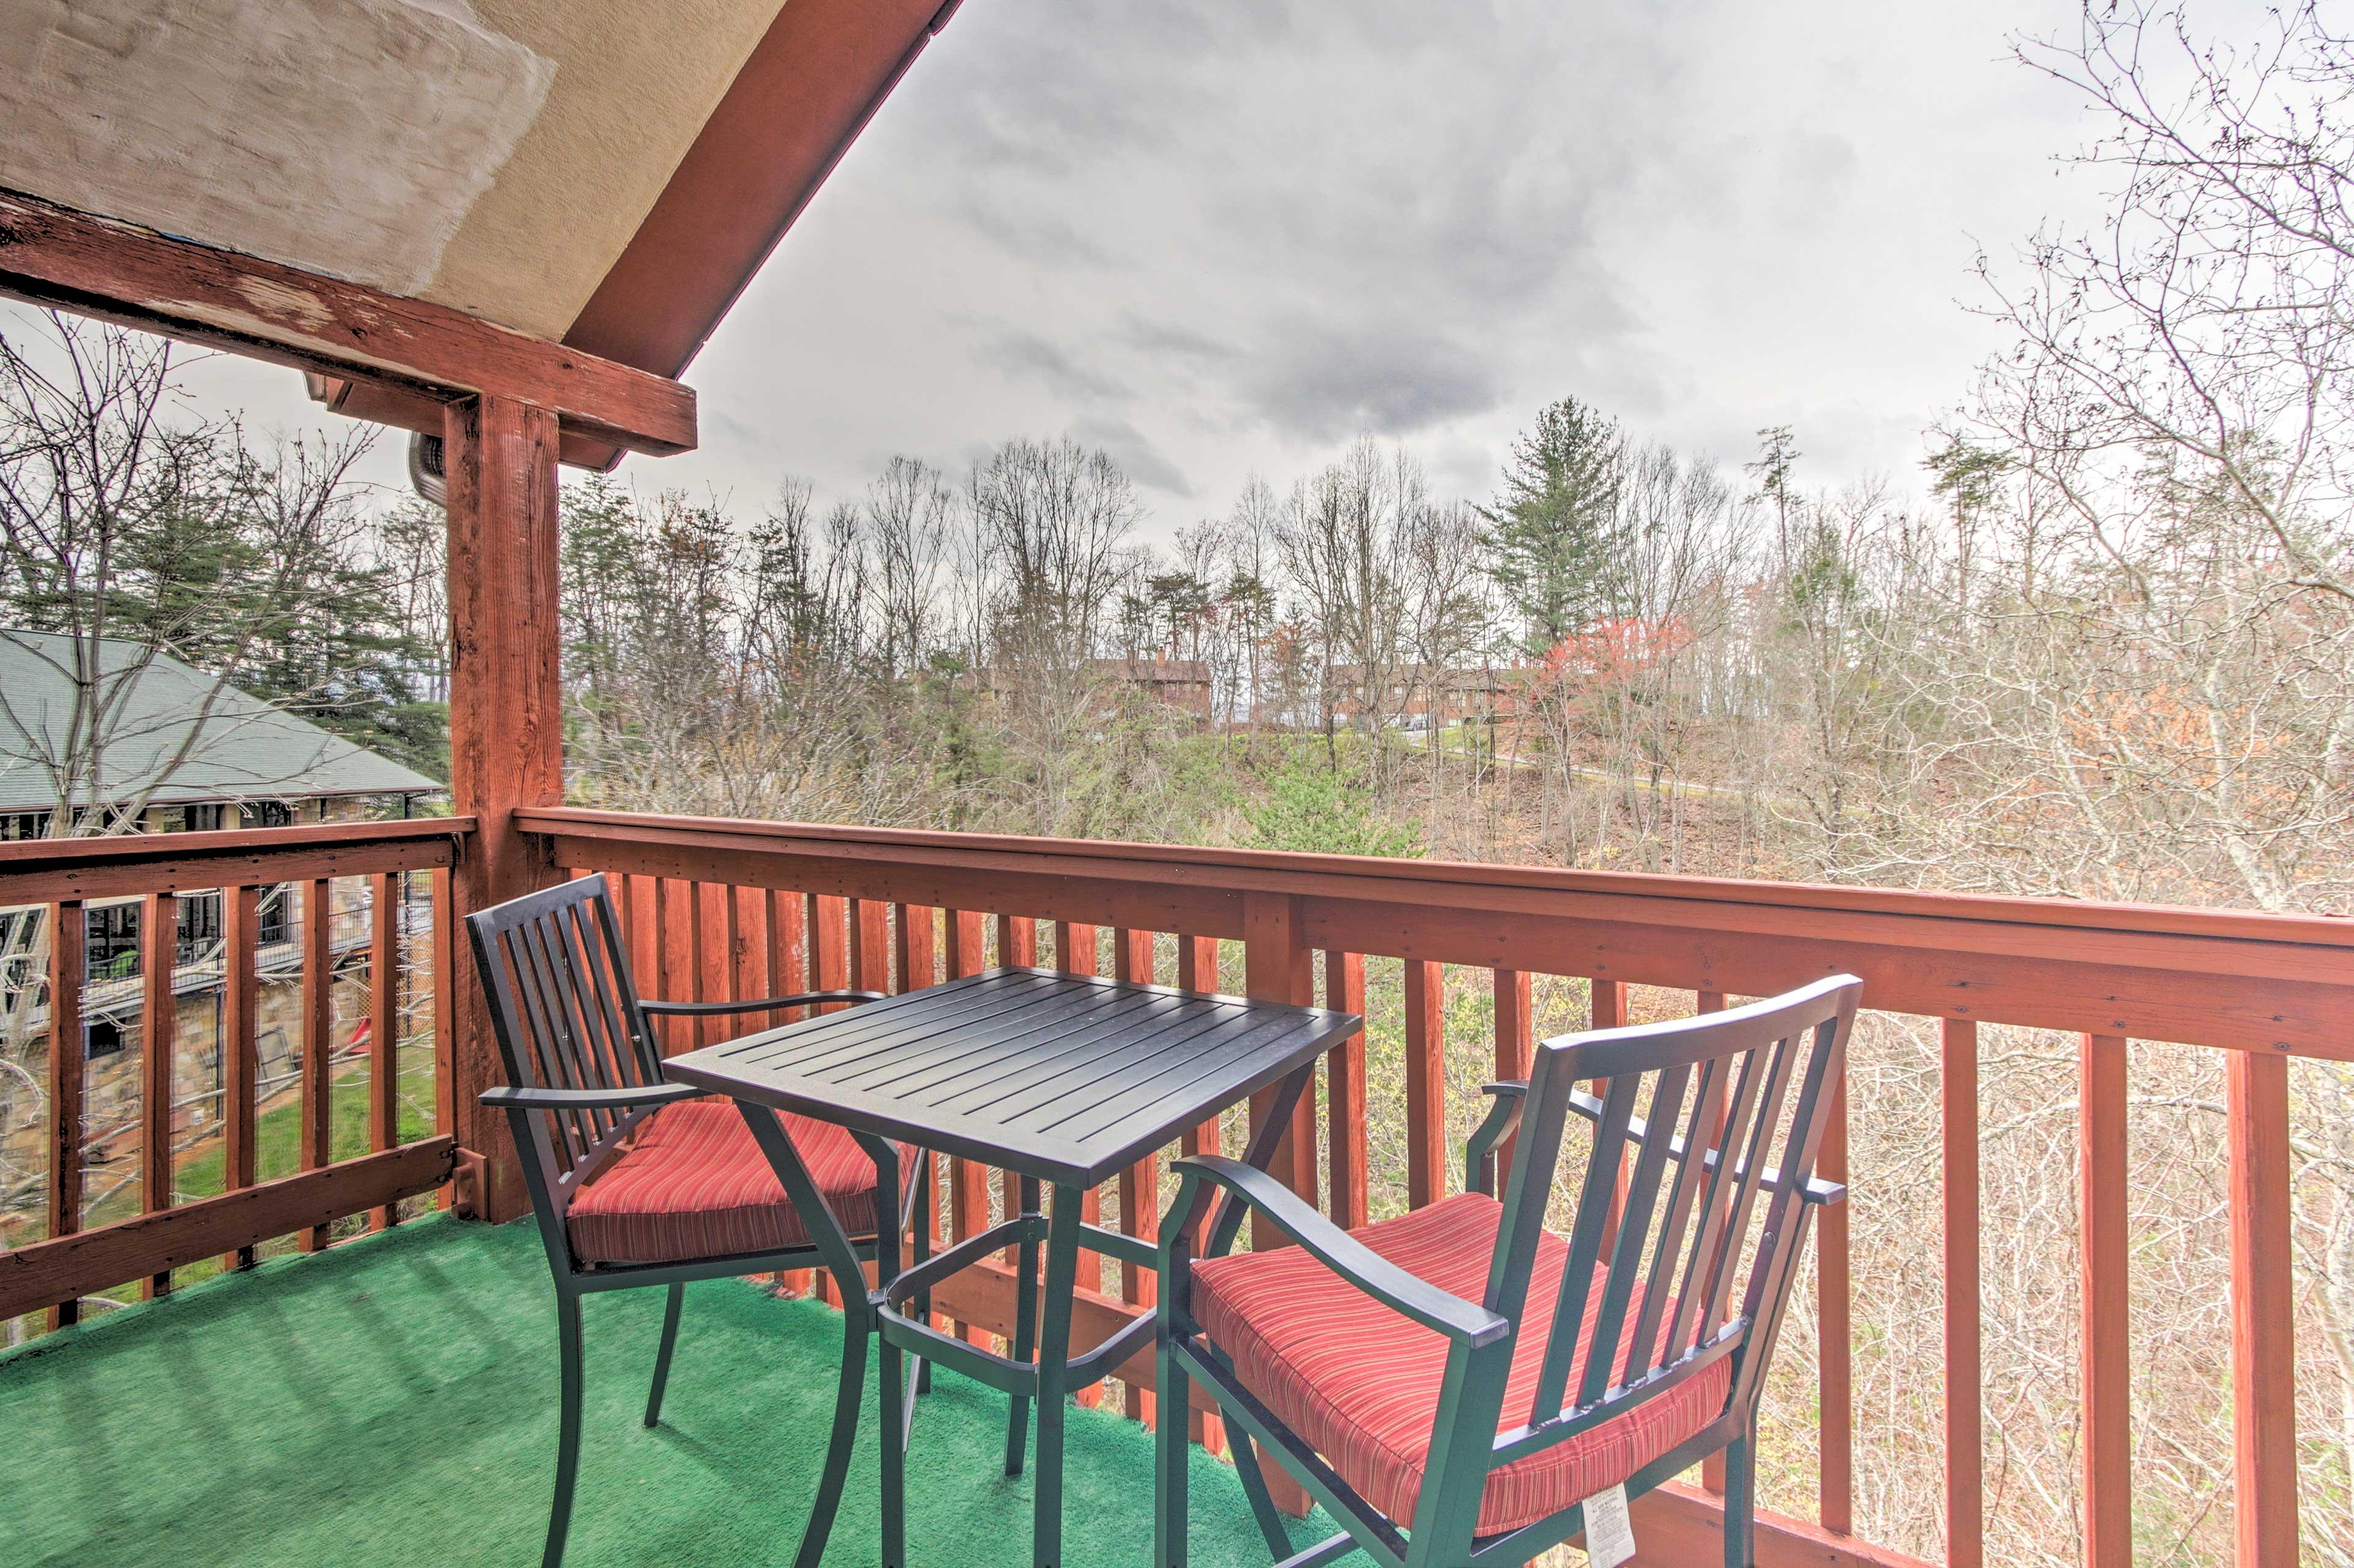 Boasting 2 balconies, this home ensures incredible views!